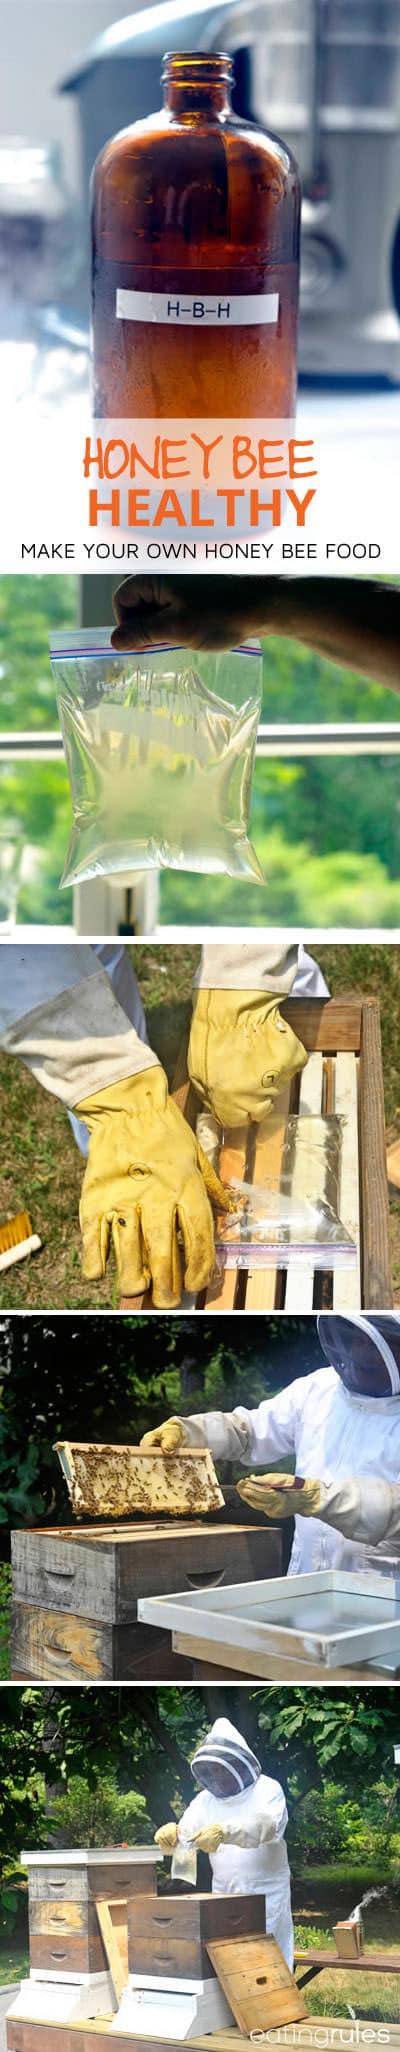 Honey Bee Healthy Honeybee Food